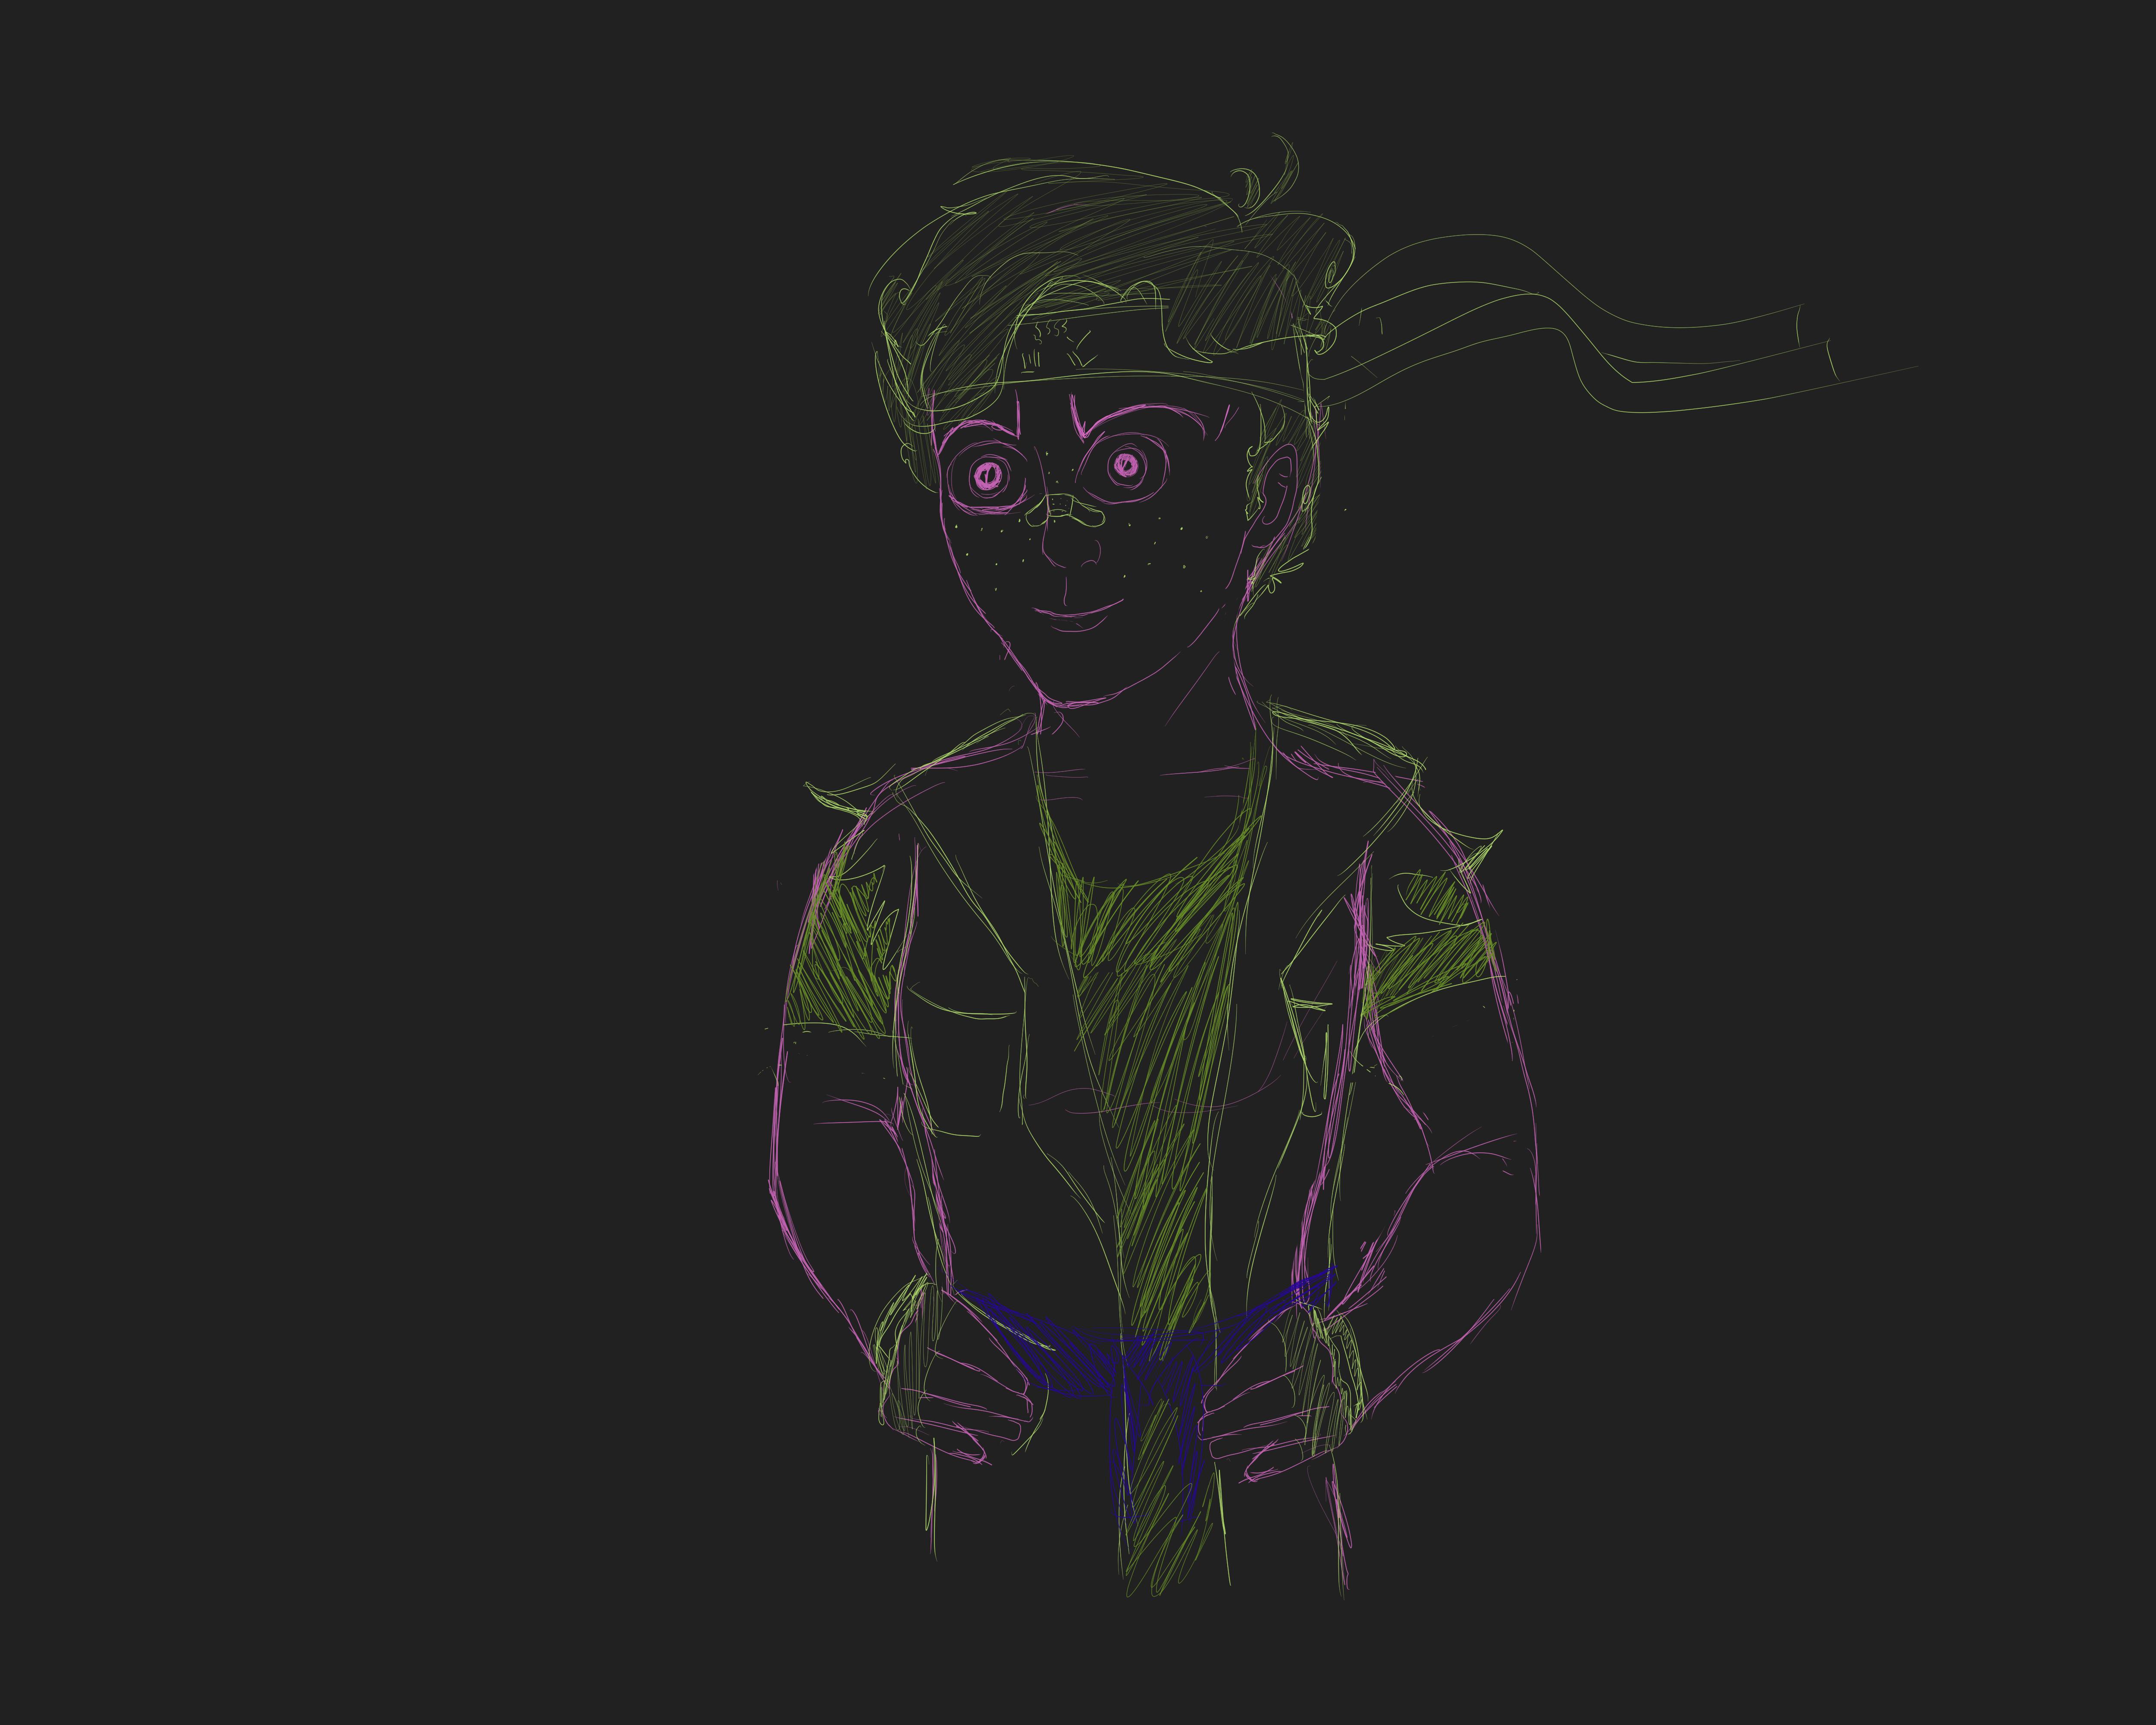 Annanas sketch